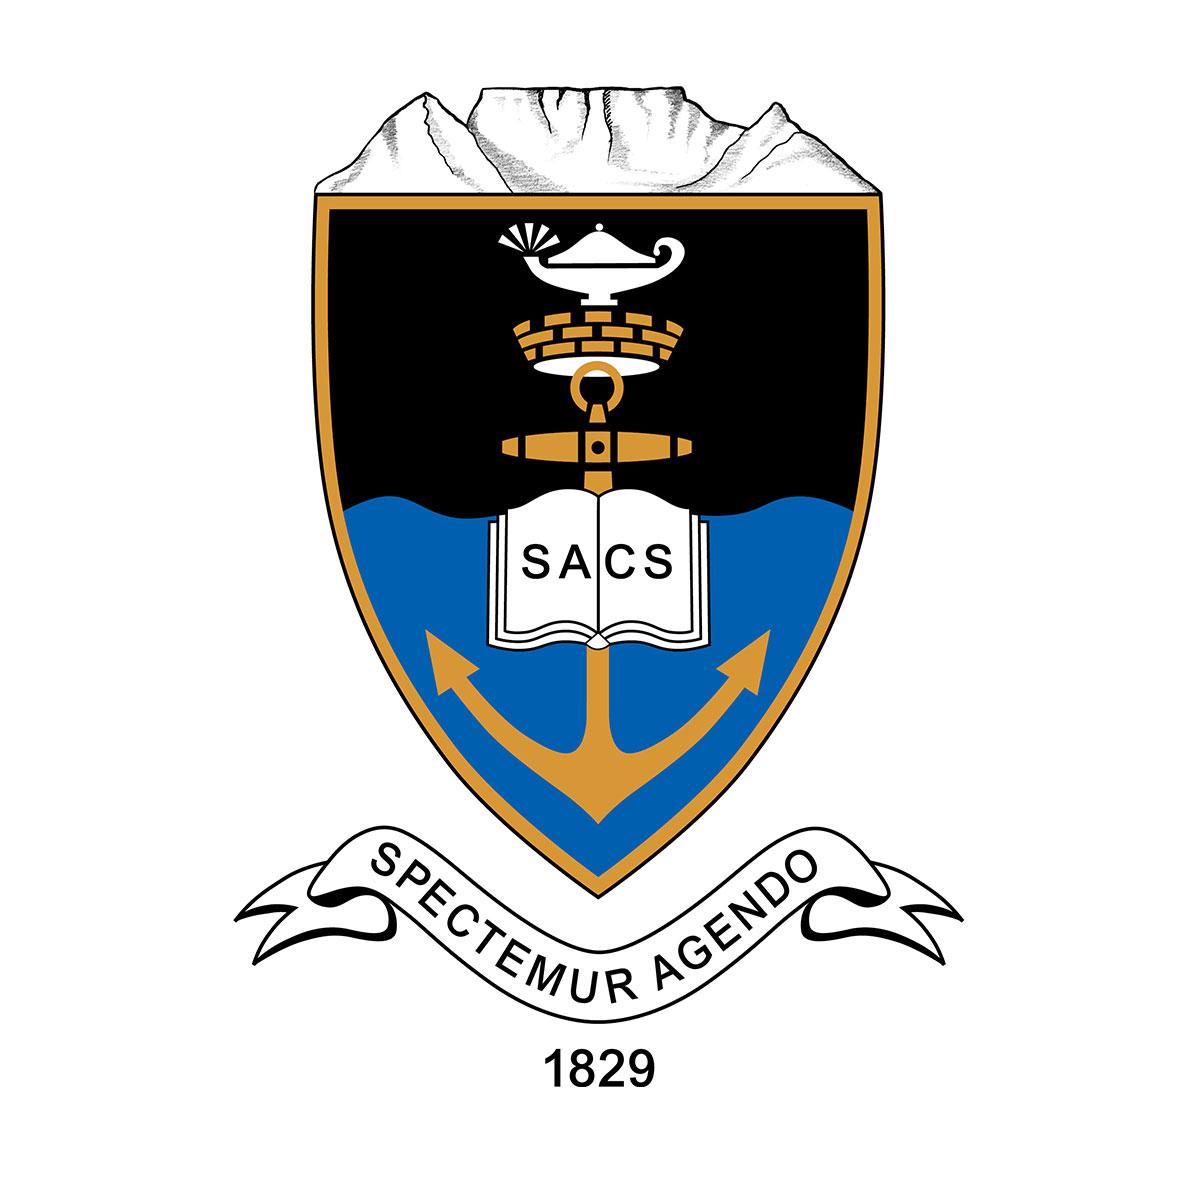 SACS High School